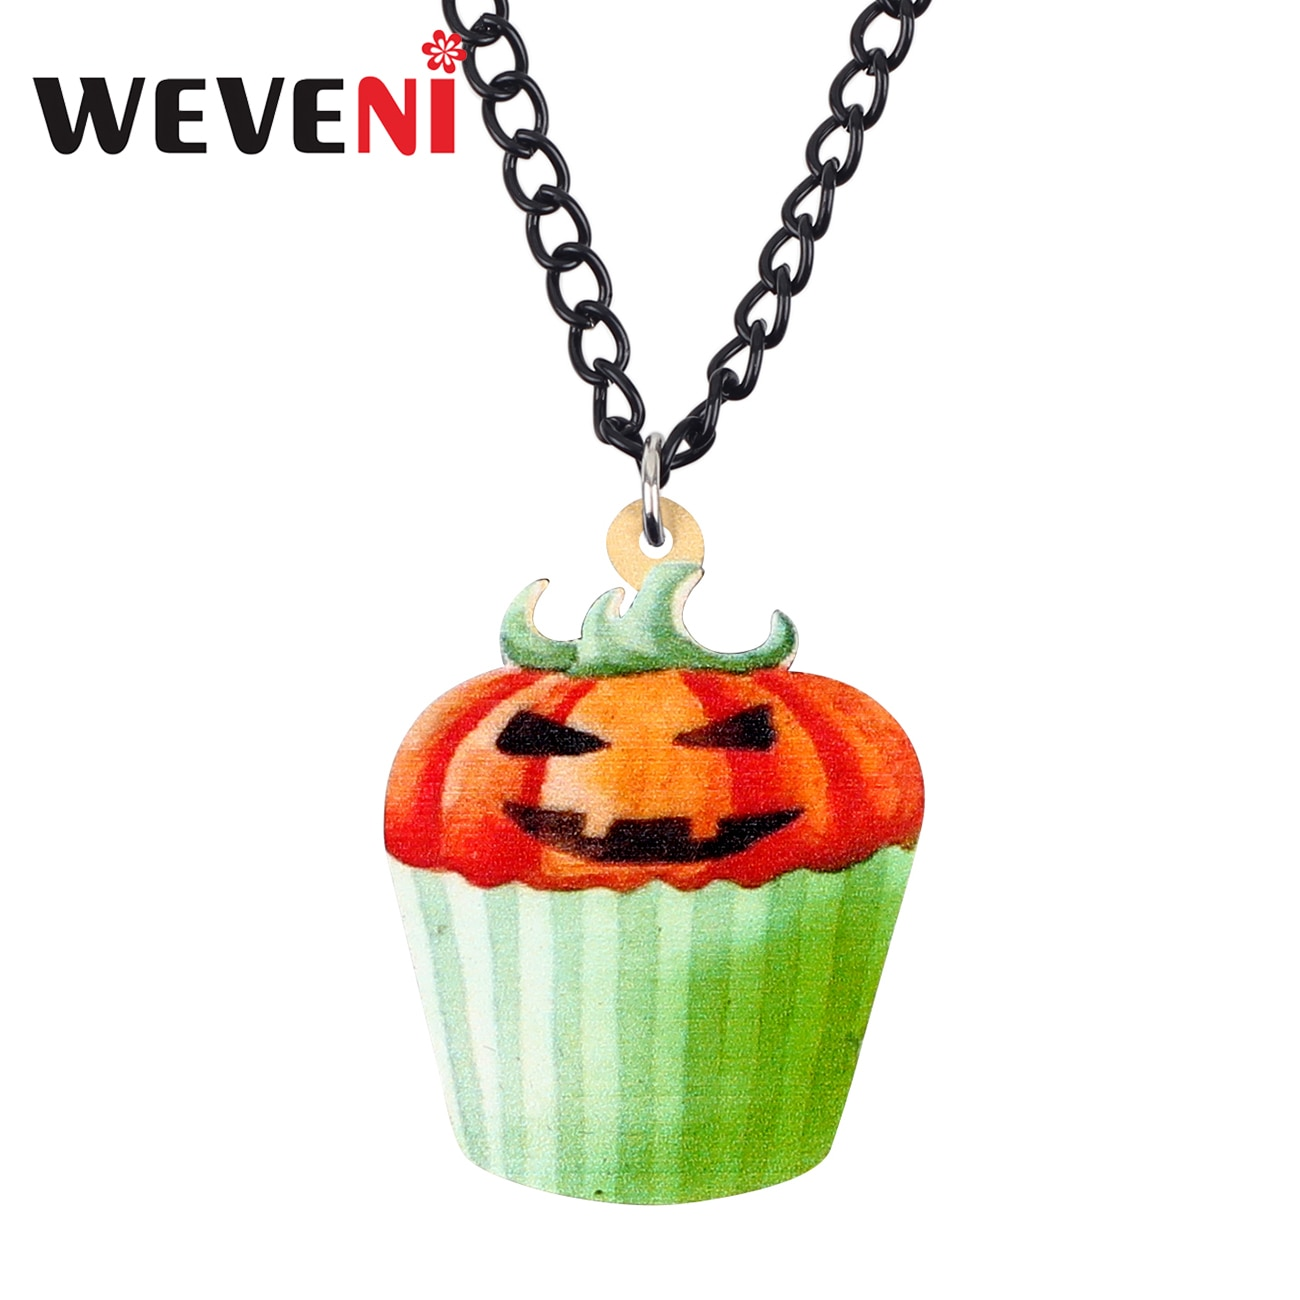 WEVENI acrílico Halloween feliz calabaza Cupcake COLLAR COLGANTE Collier lindo comida joyería para mujeres niñas adolescentes regalo Bijoux 2019